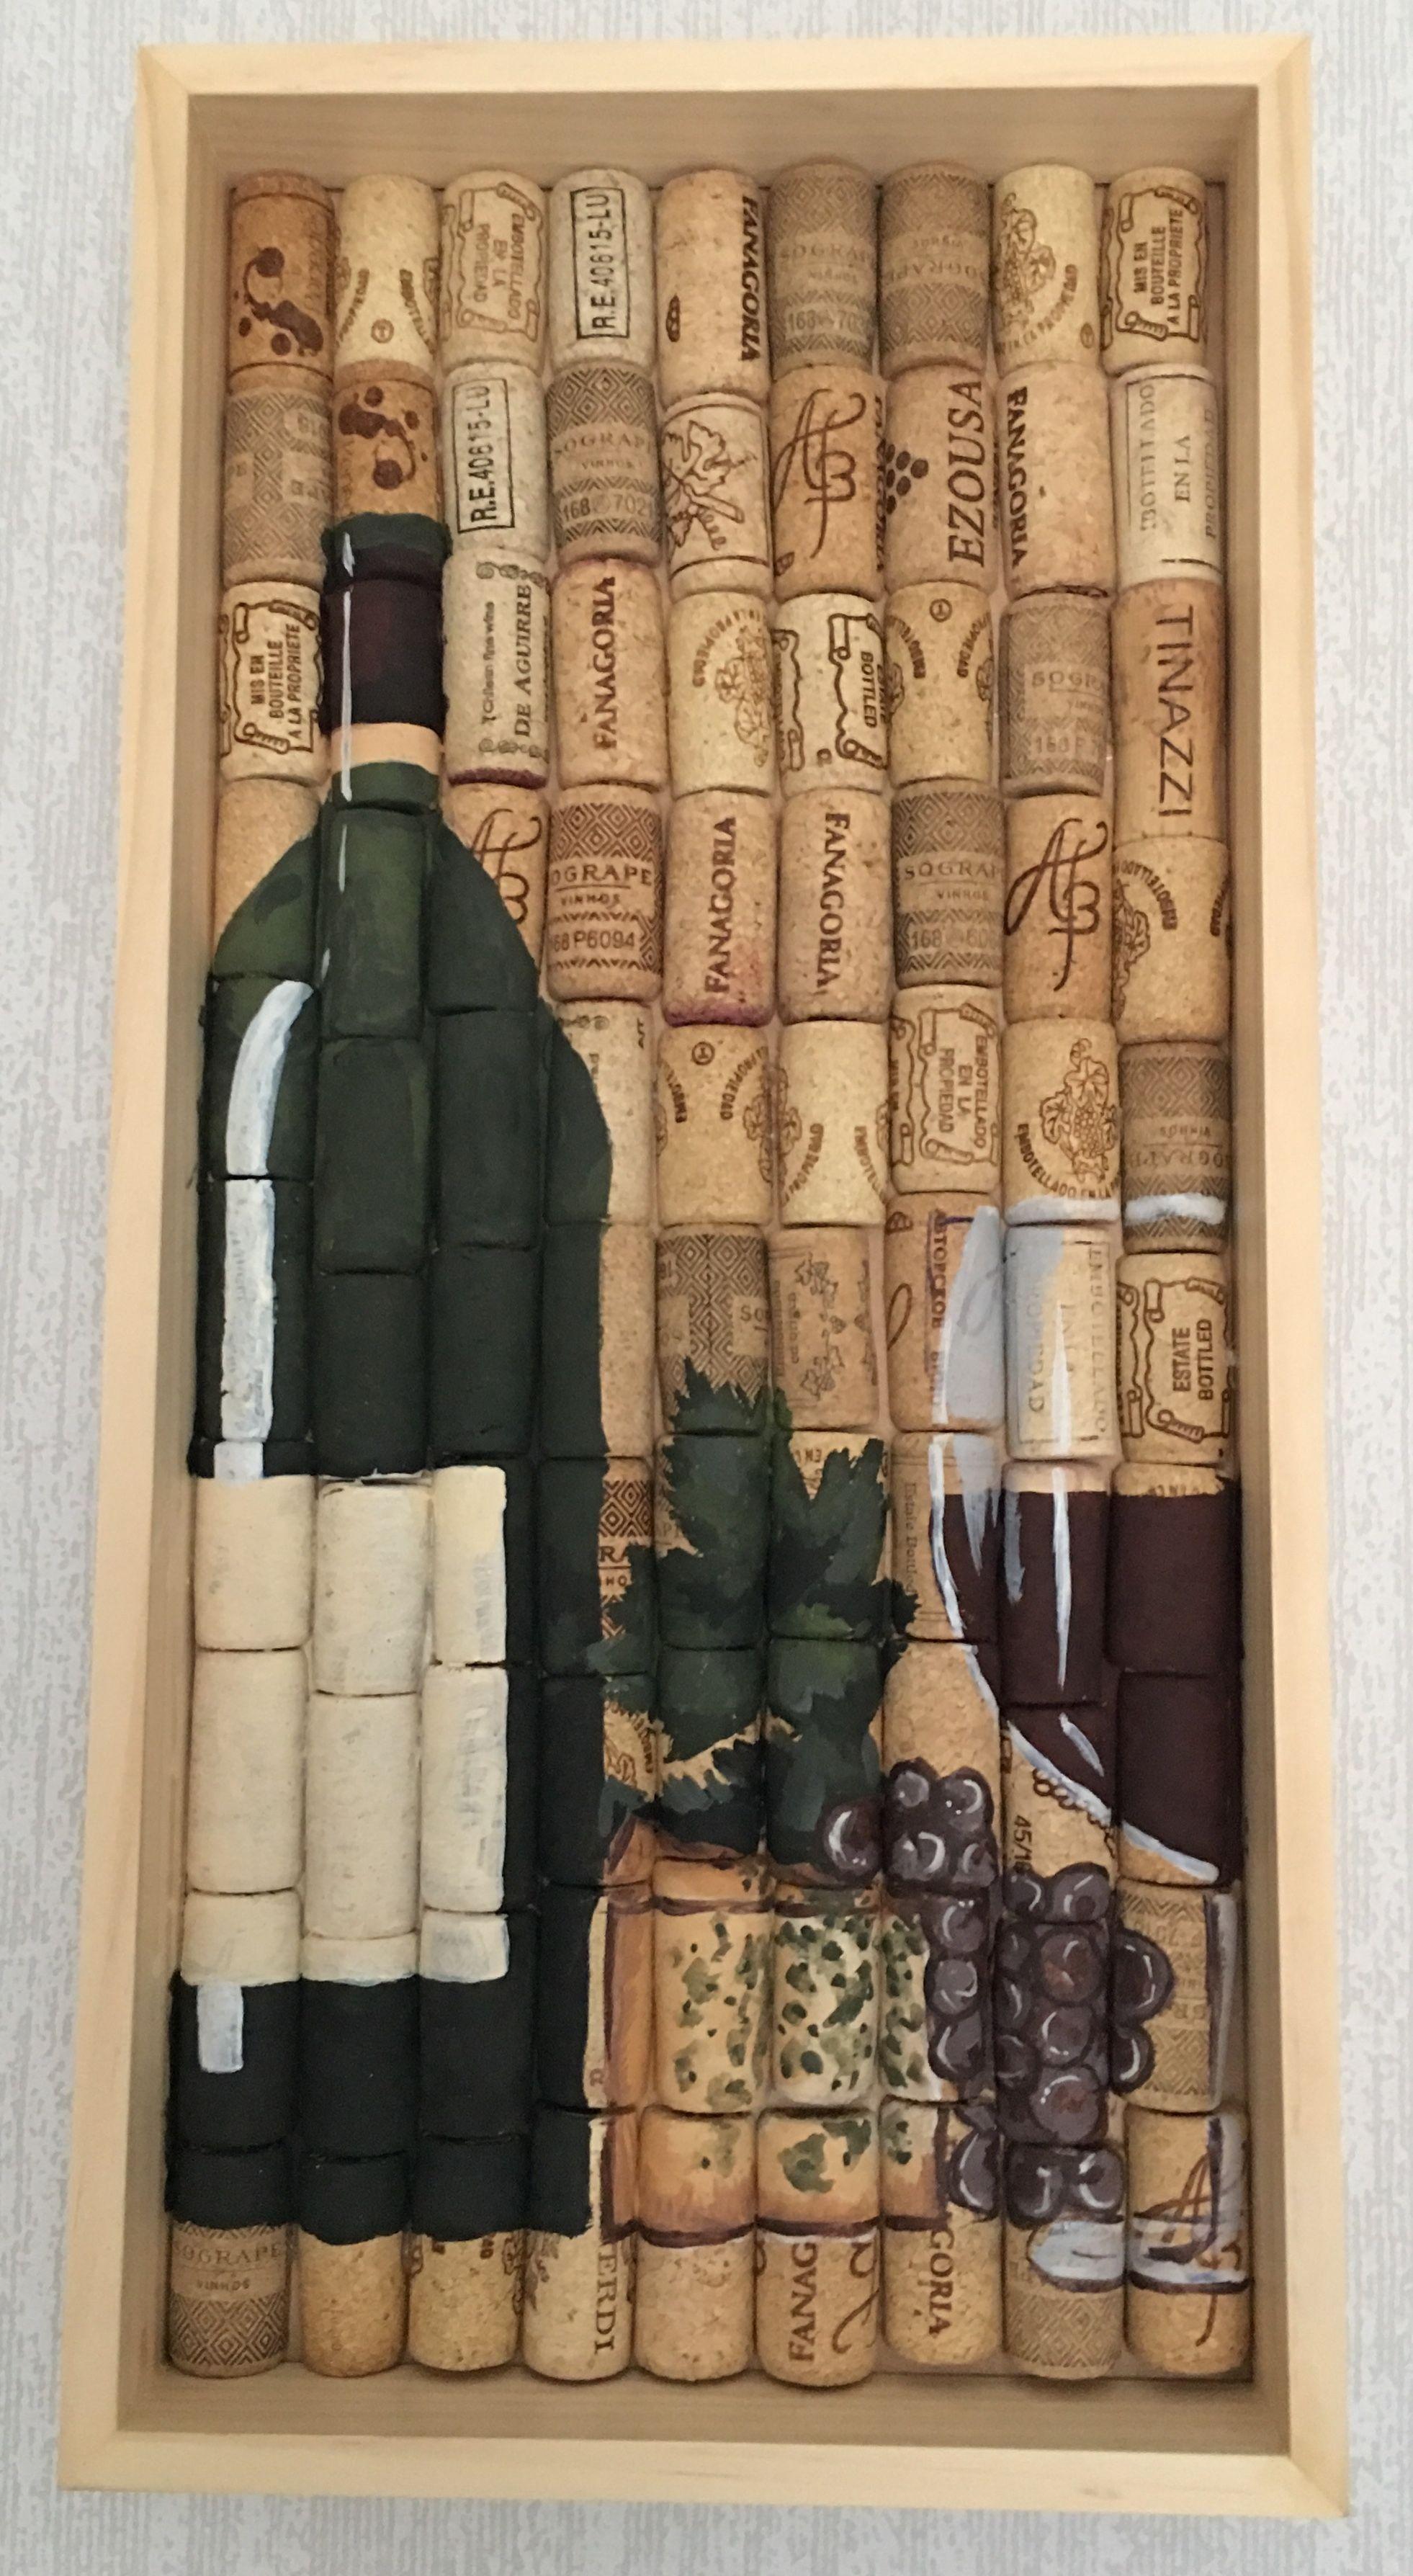 Cork wine art made by Alina K